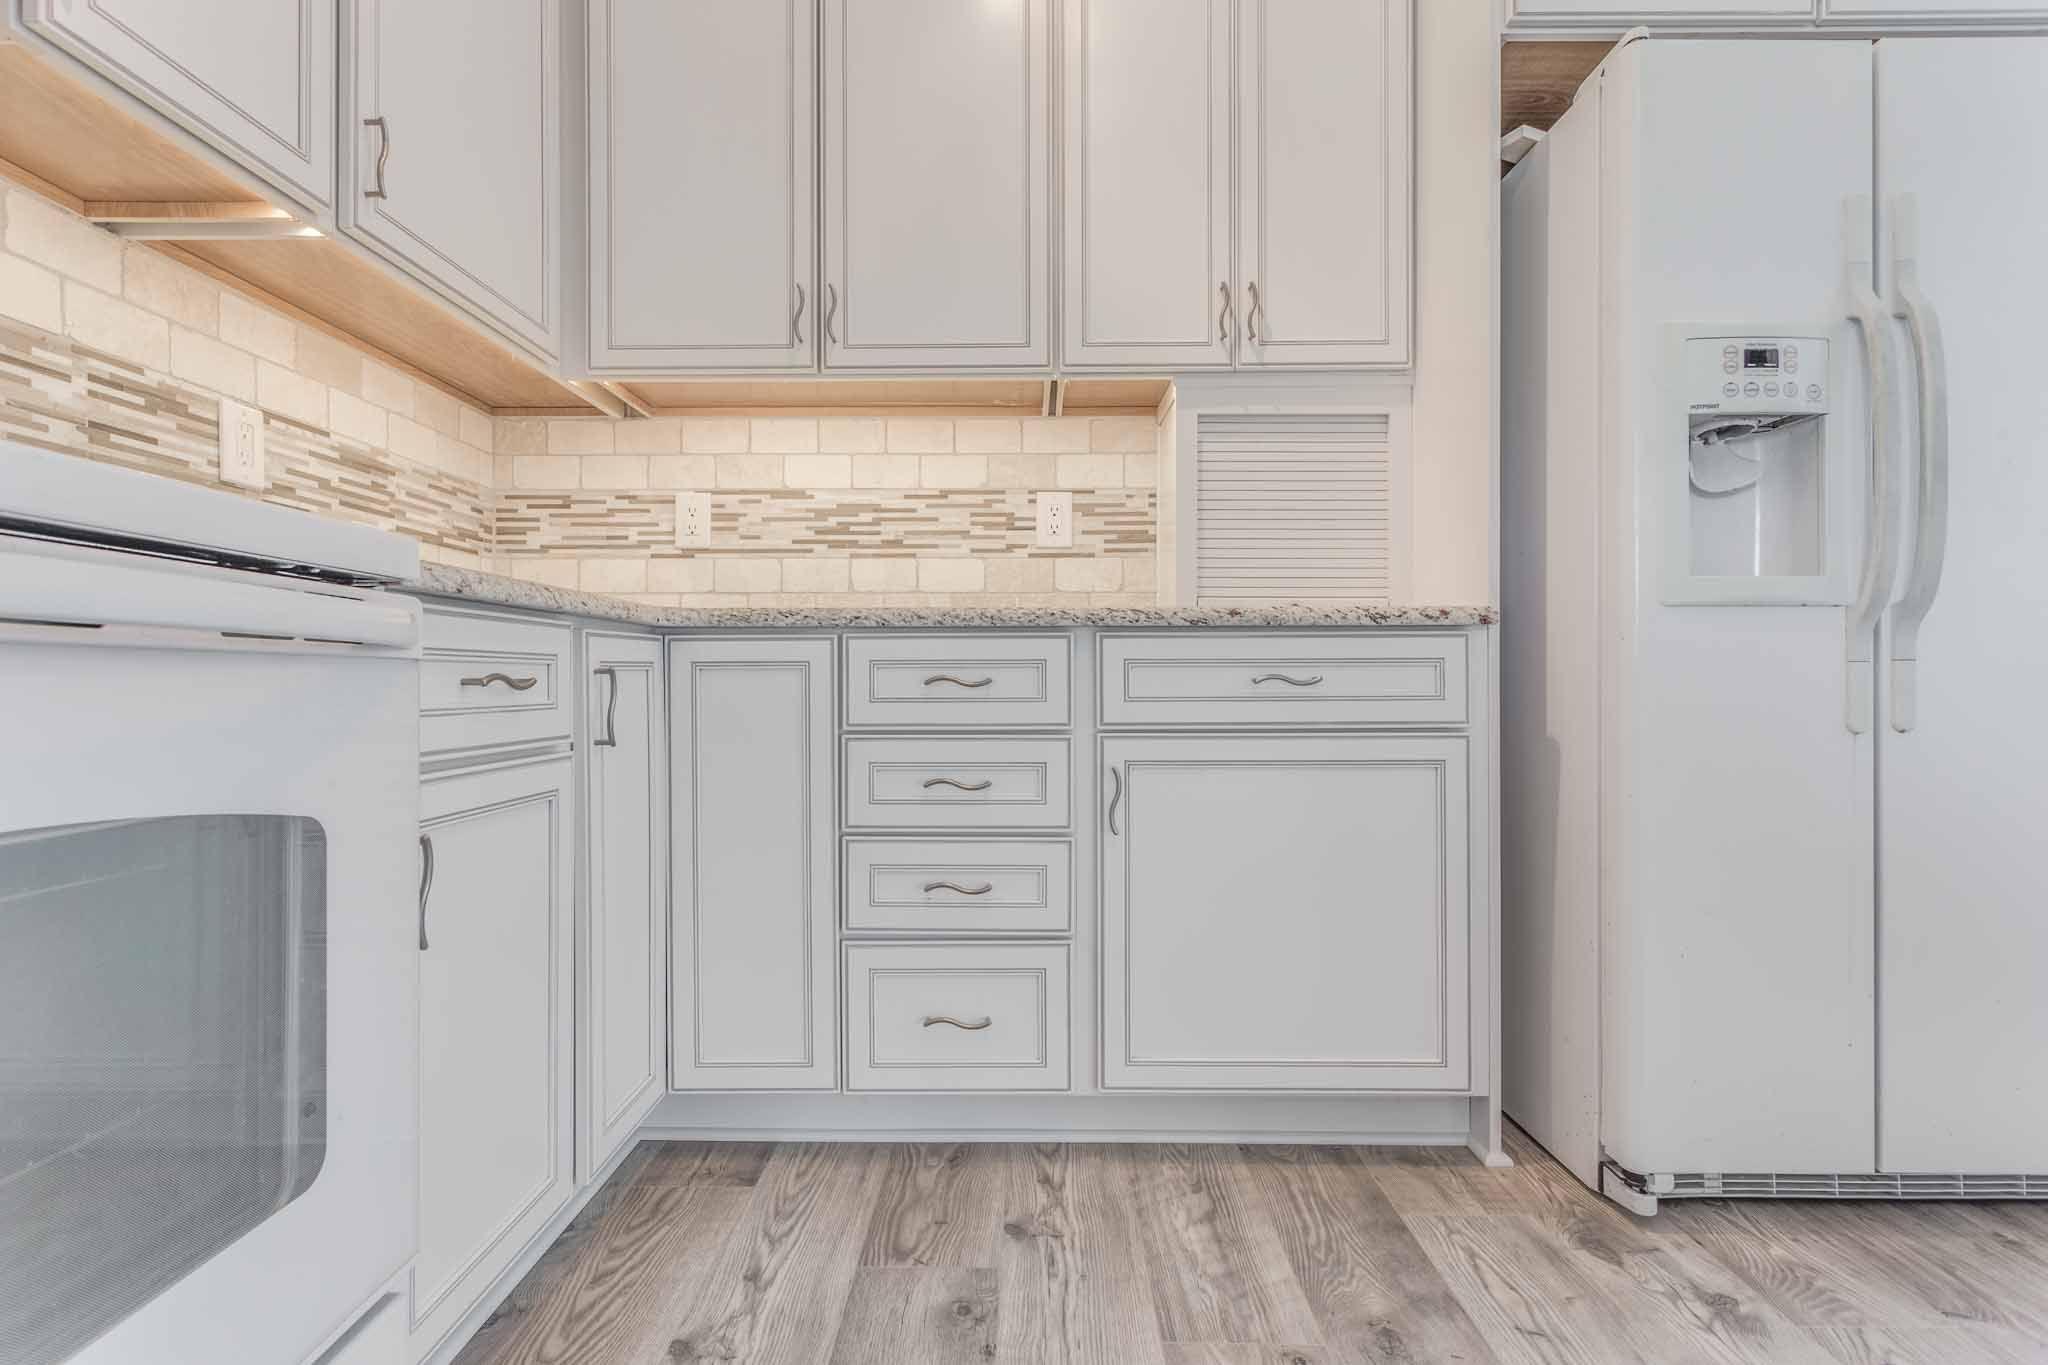 Kitchen Remodel Jacksonville Fl Stools Walmart Merillat 'bellingham' Cabinetry Color Is Cotton W/tuscan ...